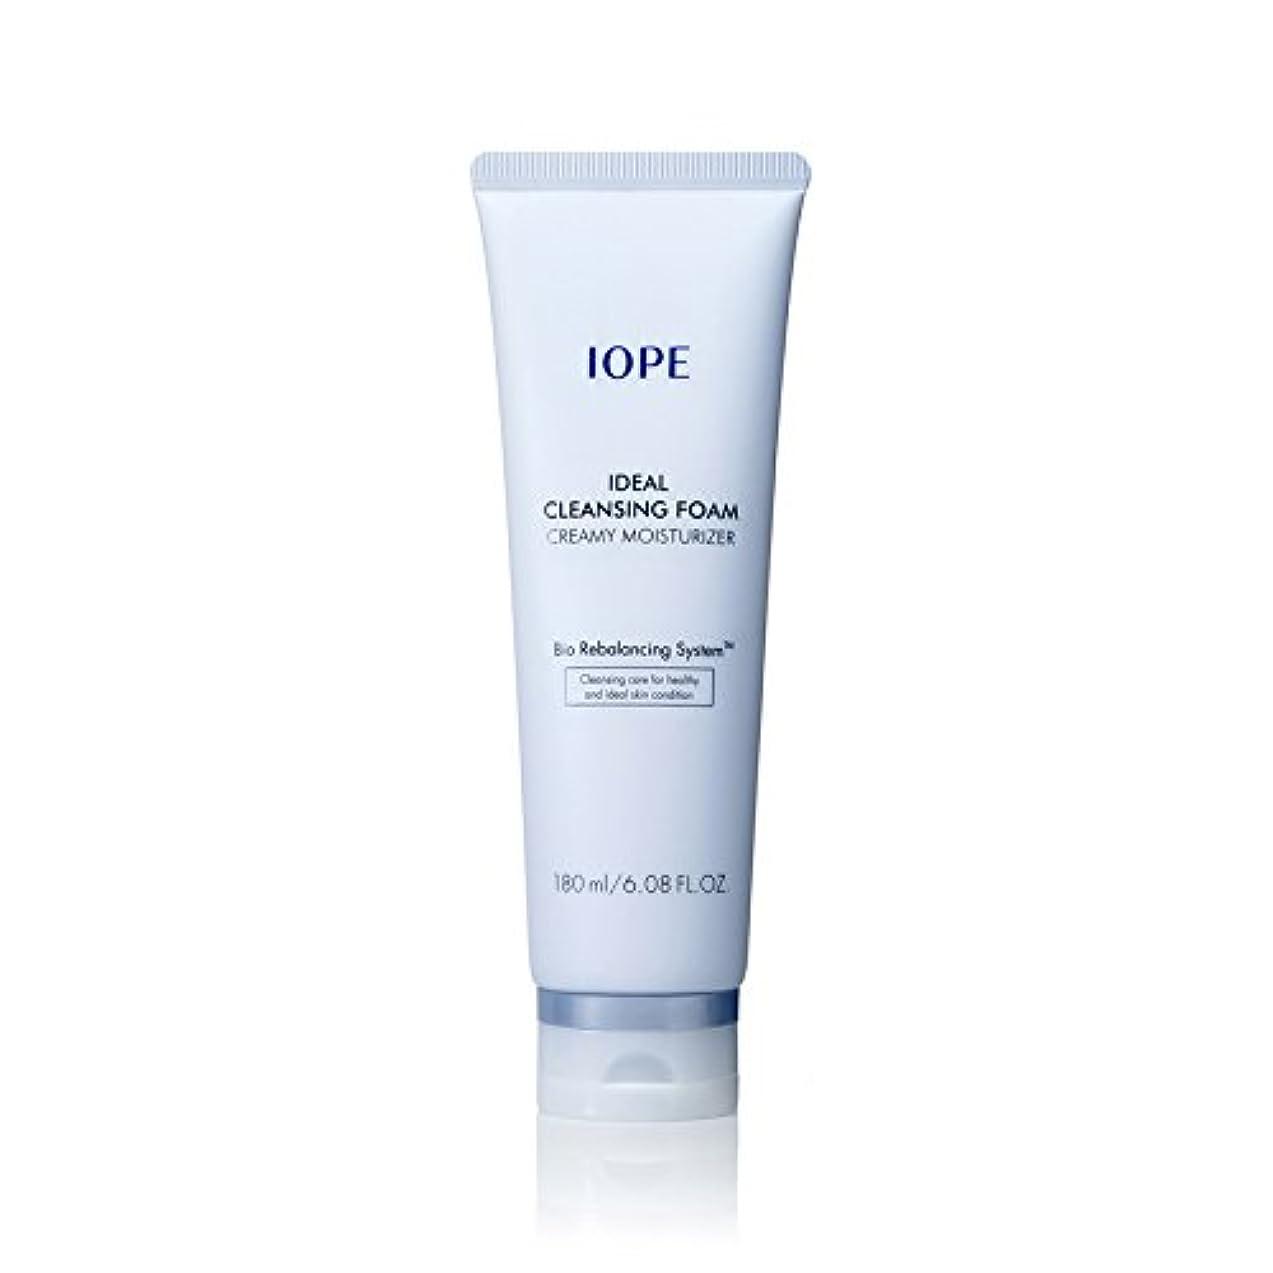 [New Ver.] IOPE Ideal Cleansing Foam Creamy Moisturizer 180ml/アイオペ アイディアル クレンジングフォーム クリーミー モイスチャライザー 180ml [並行輸入品]